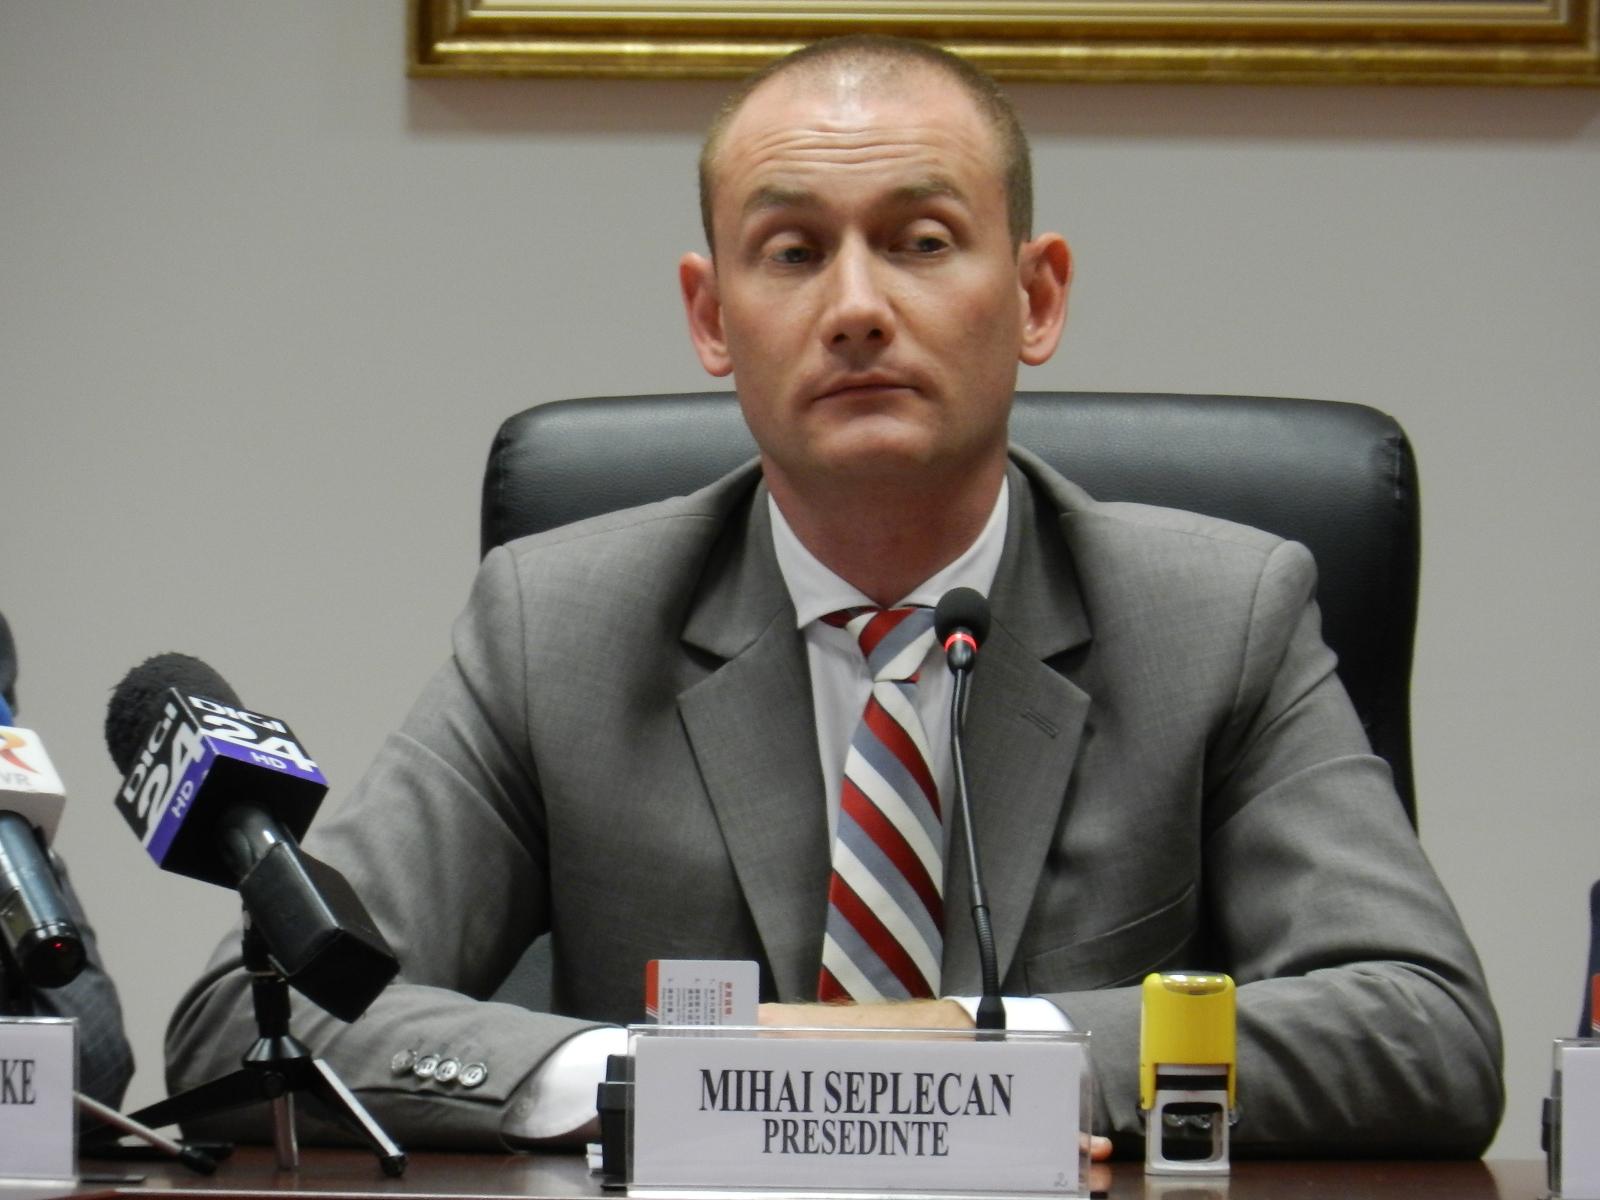 Seplecan acuză presiuni asupra sa și lansează un avertisment public